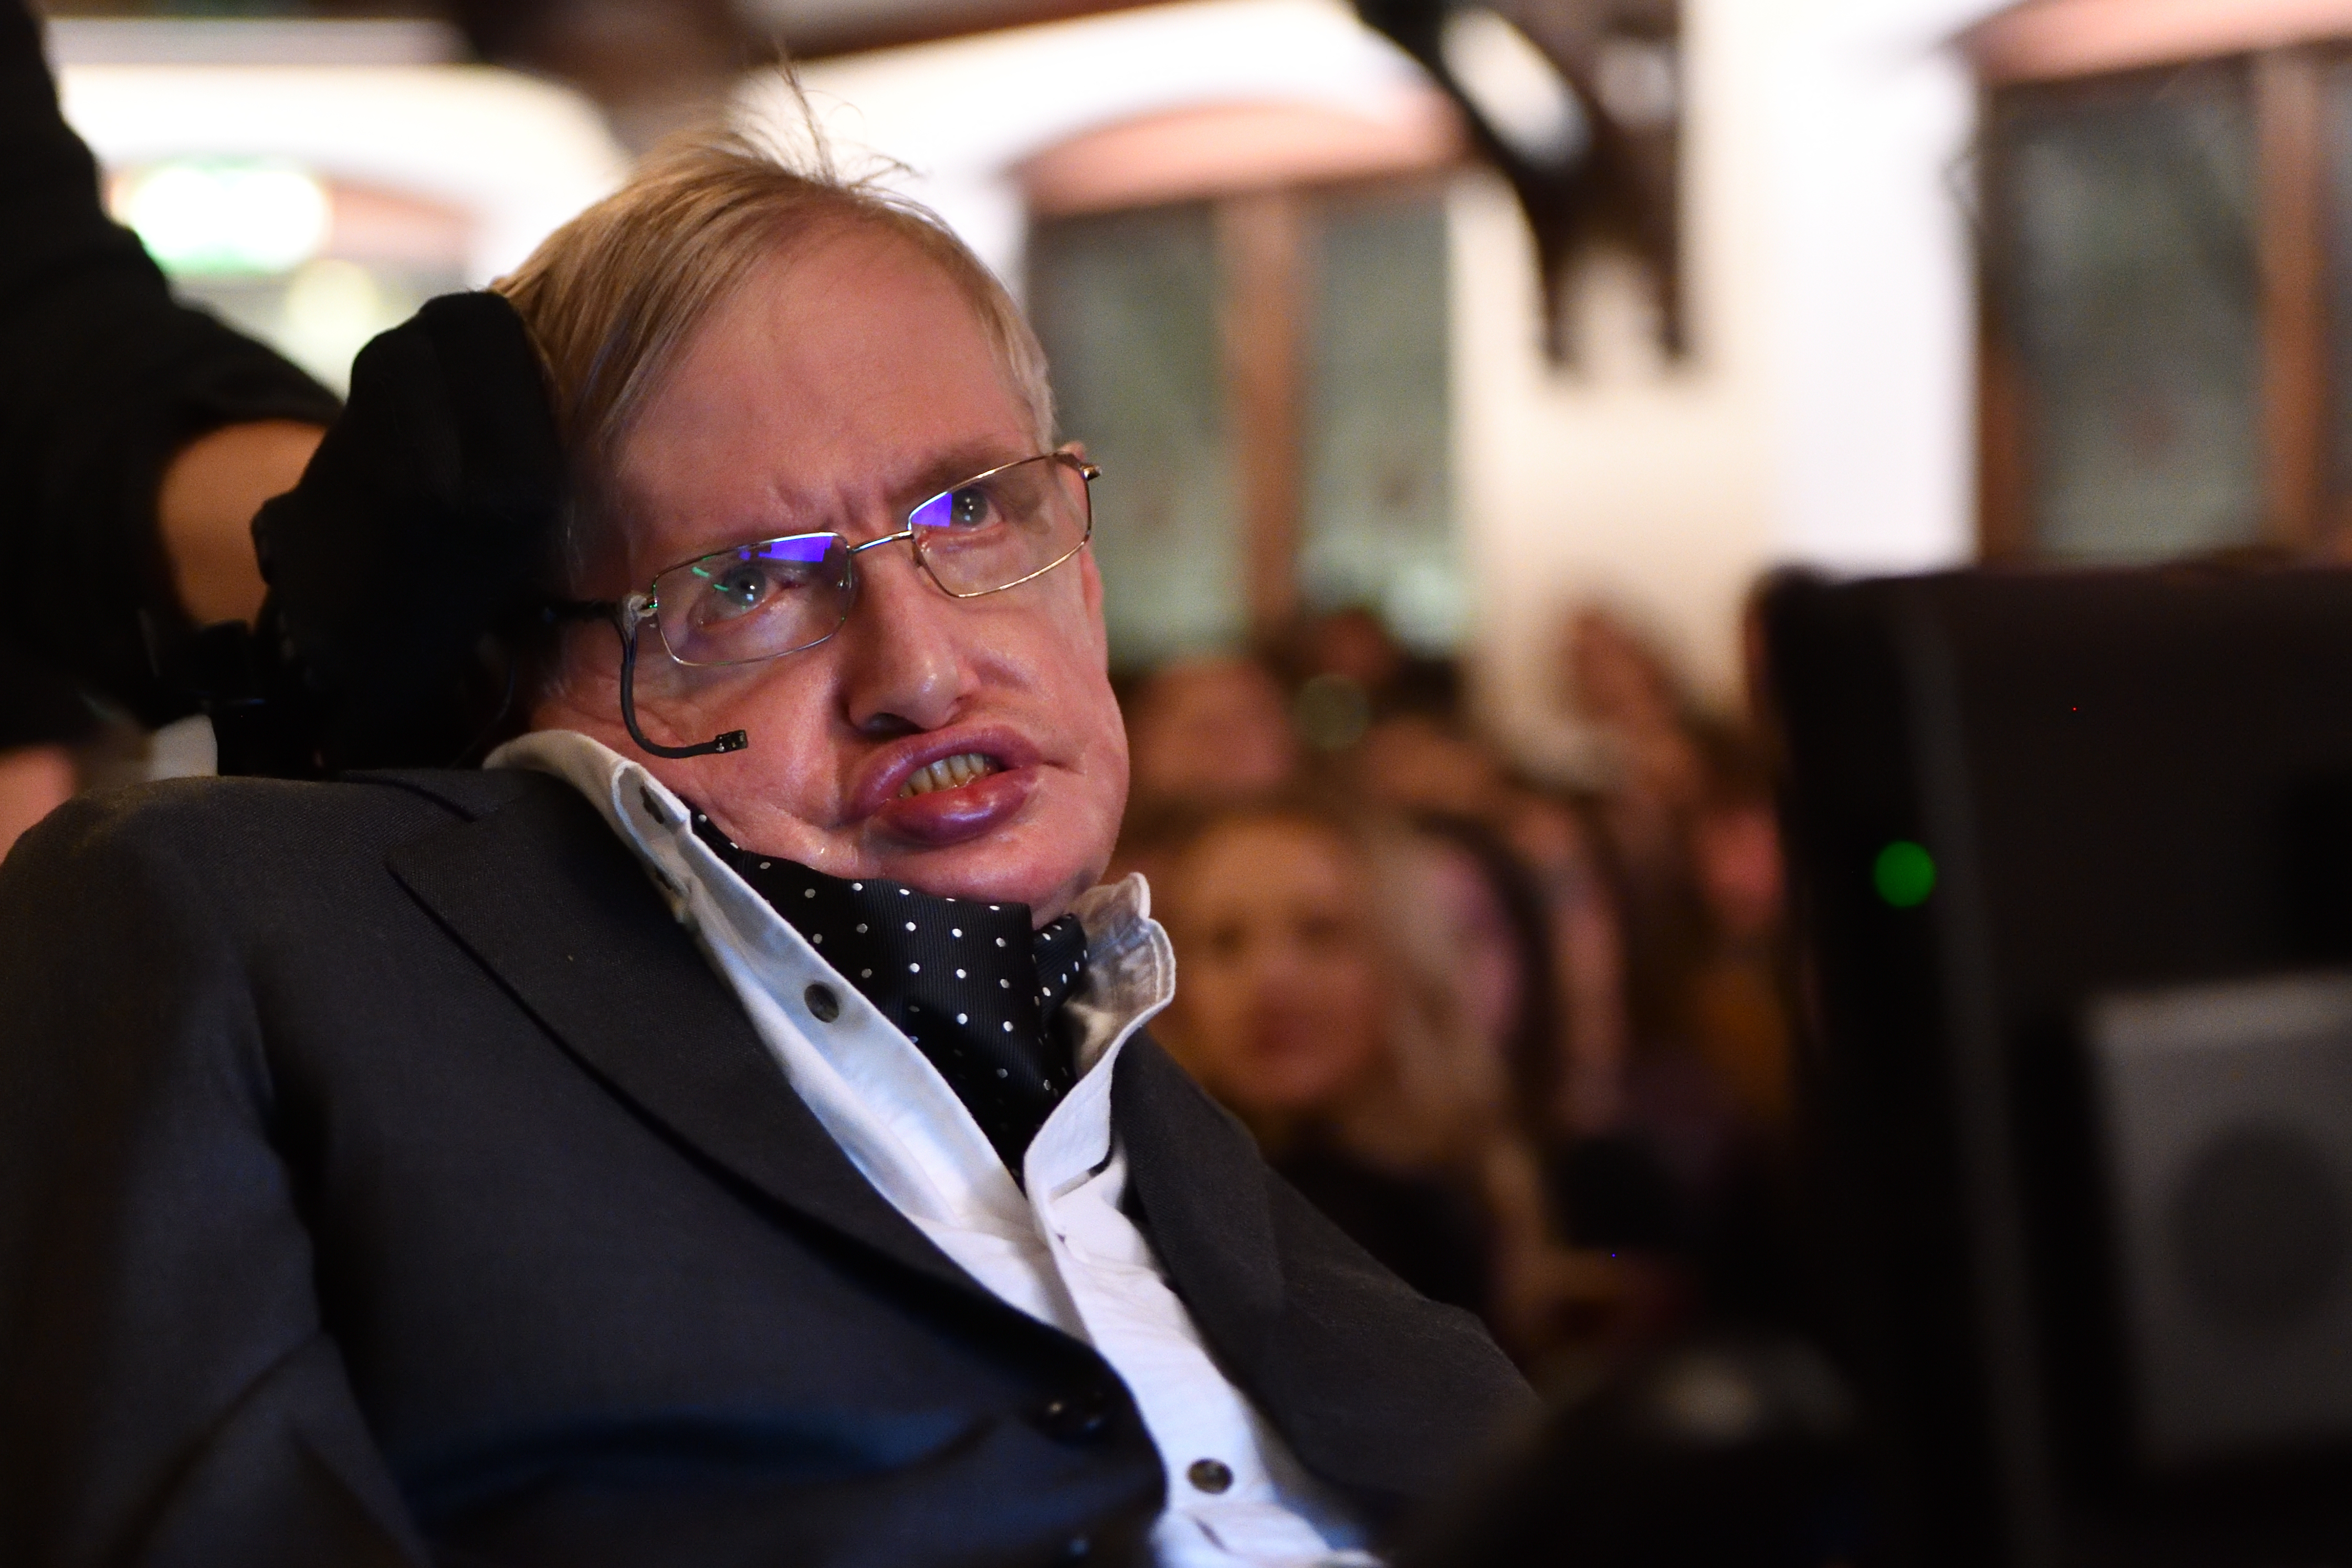 Stephen Hawking Addresses The Cambridge Union